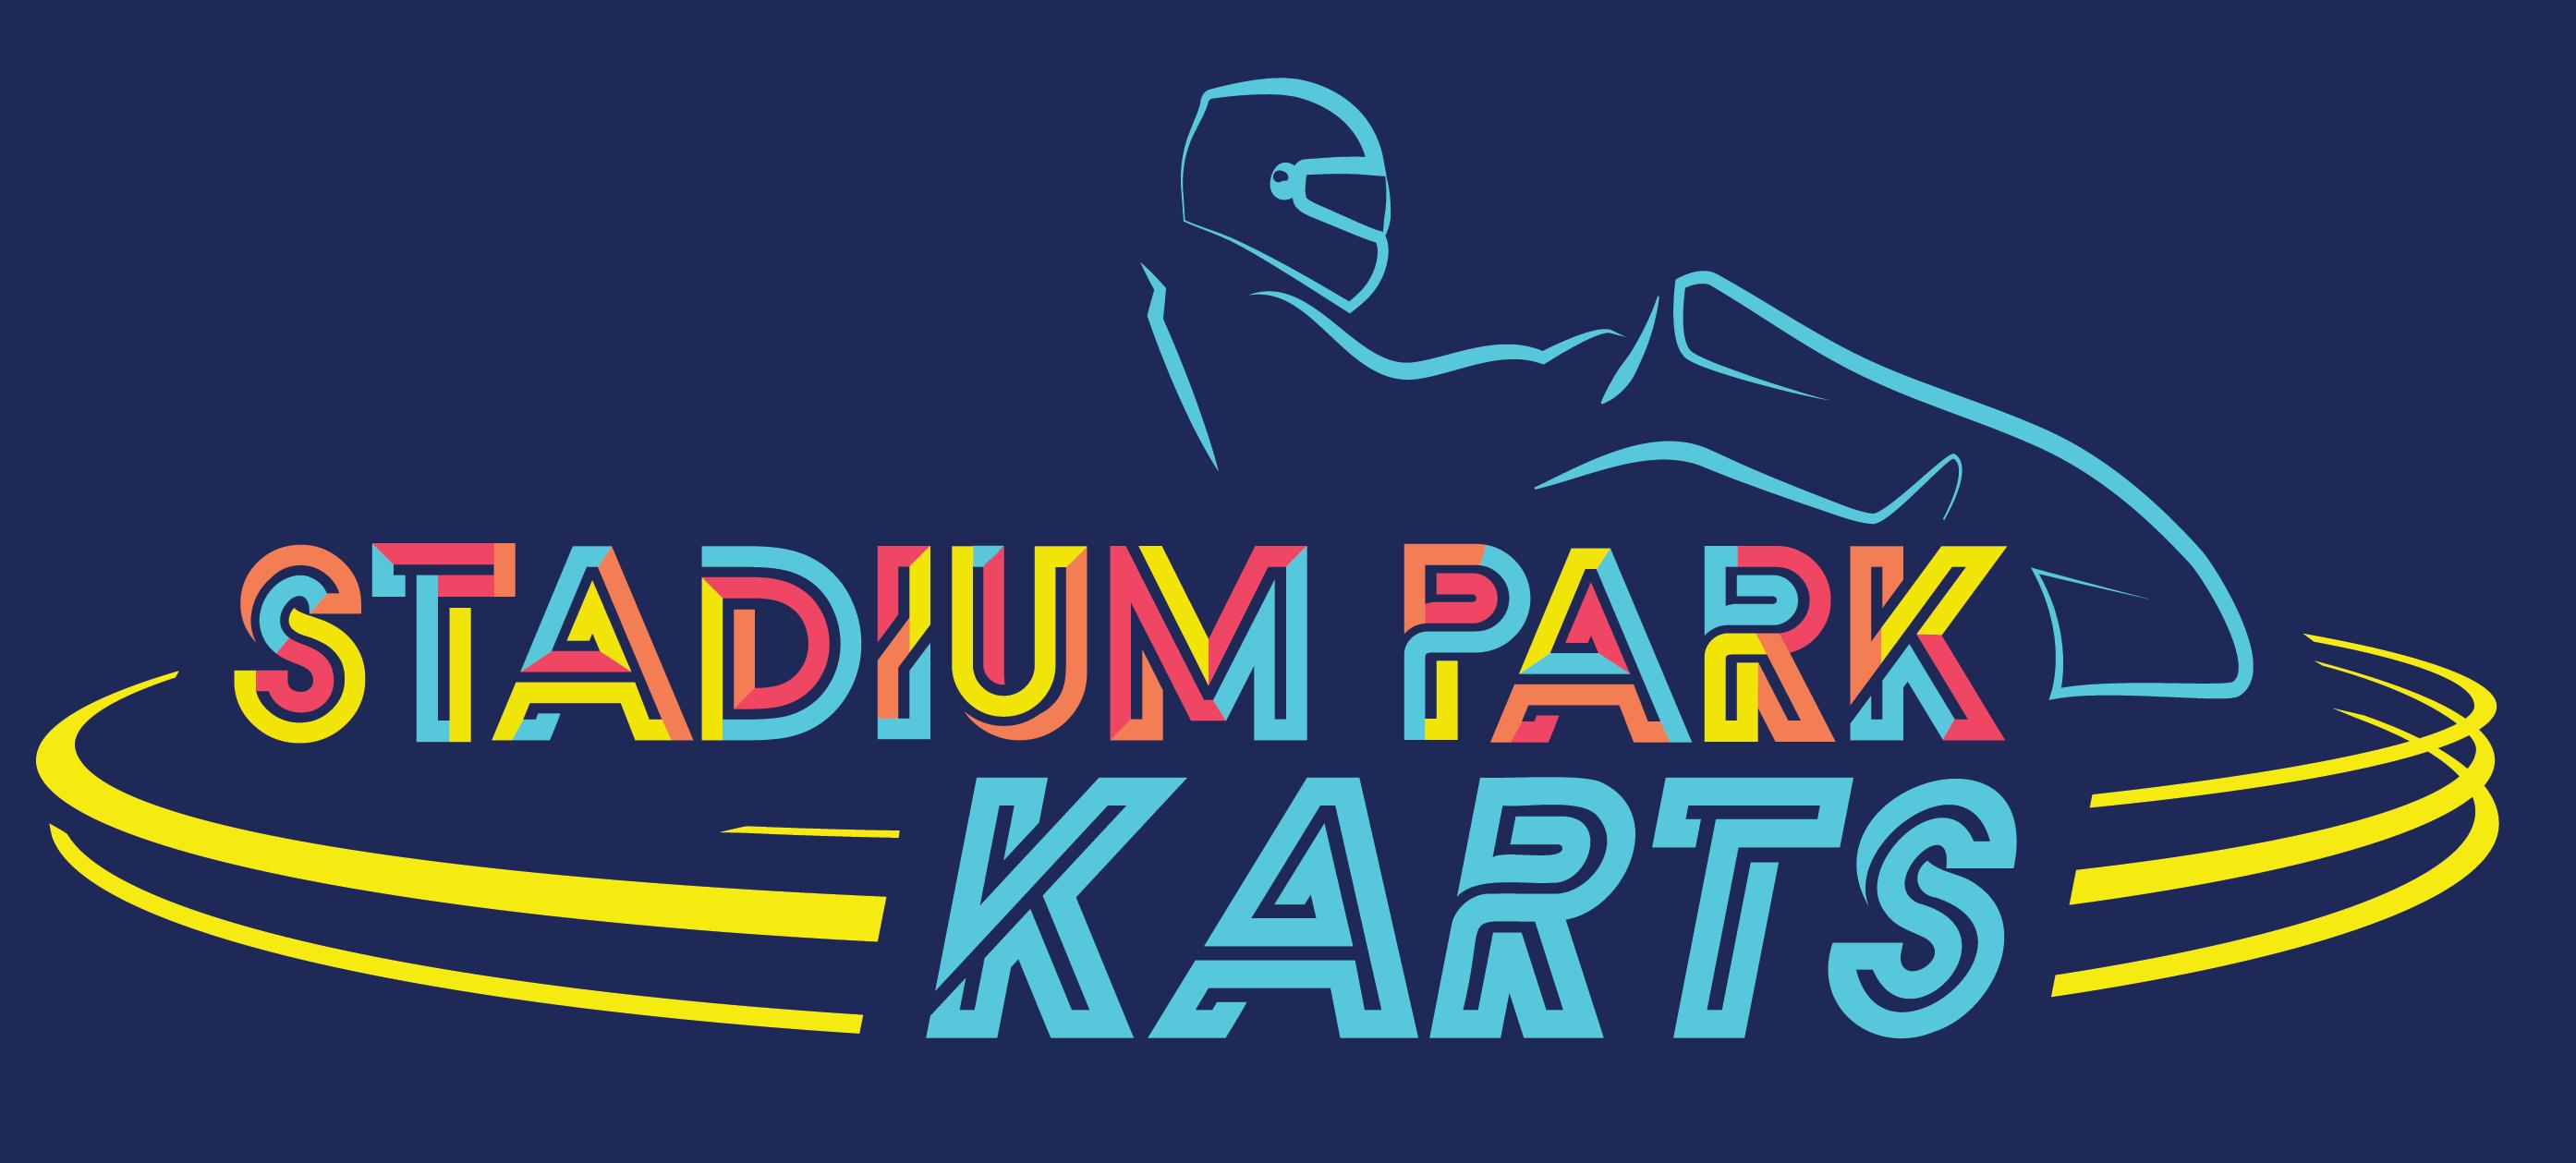 Stadium Park Karts